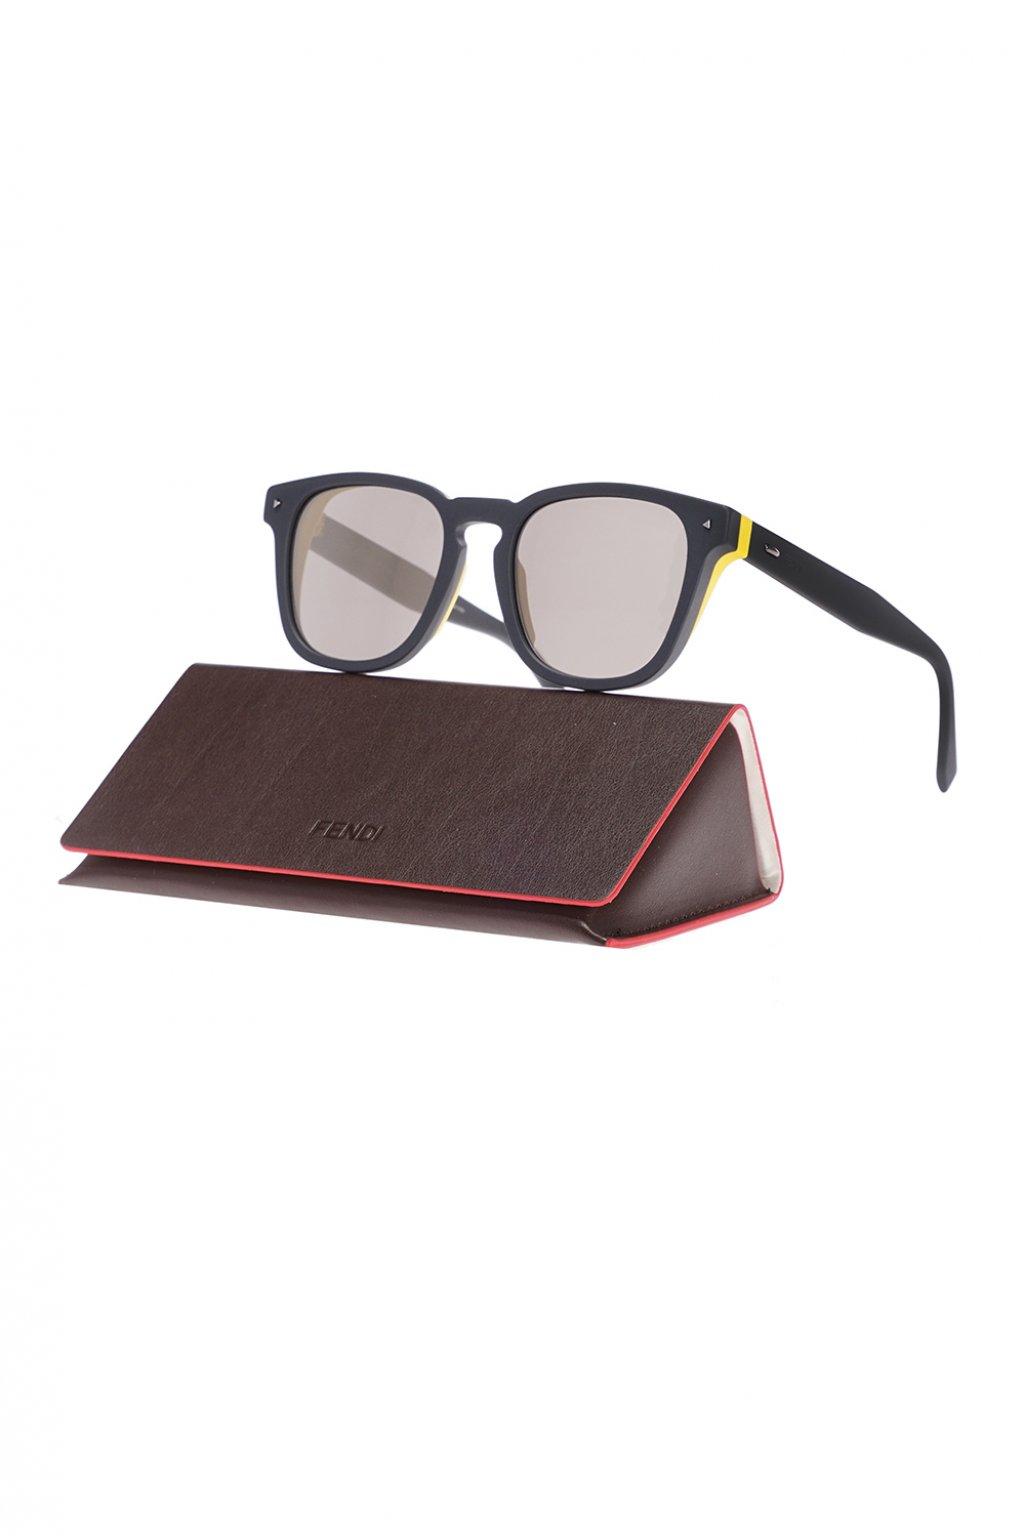 Fendi 'I see you' sunglasses